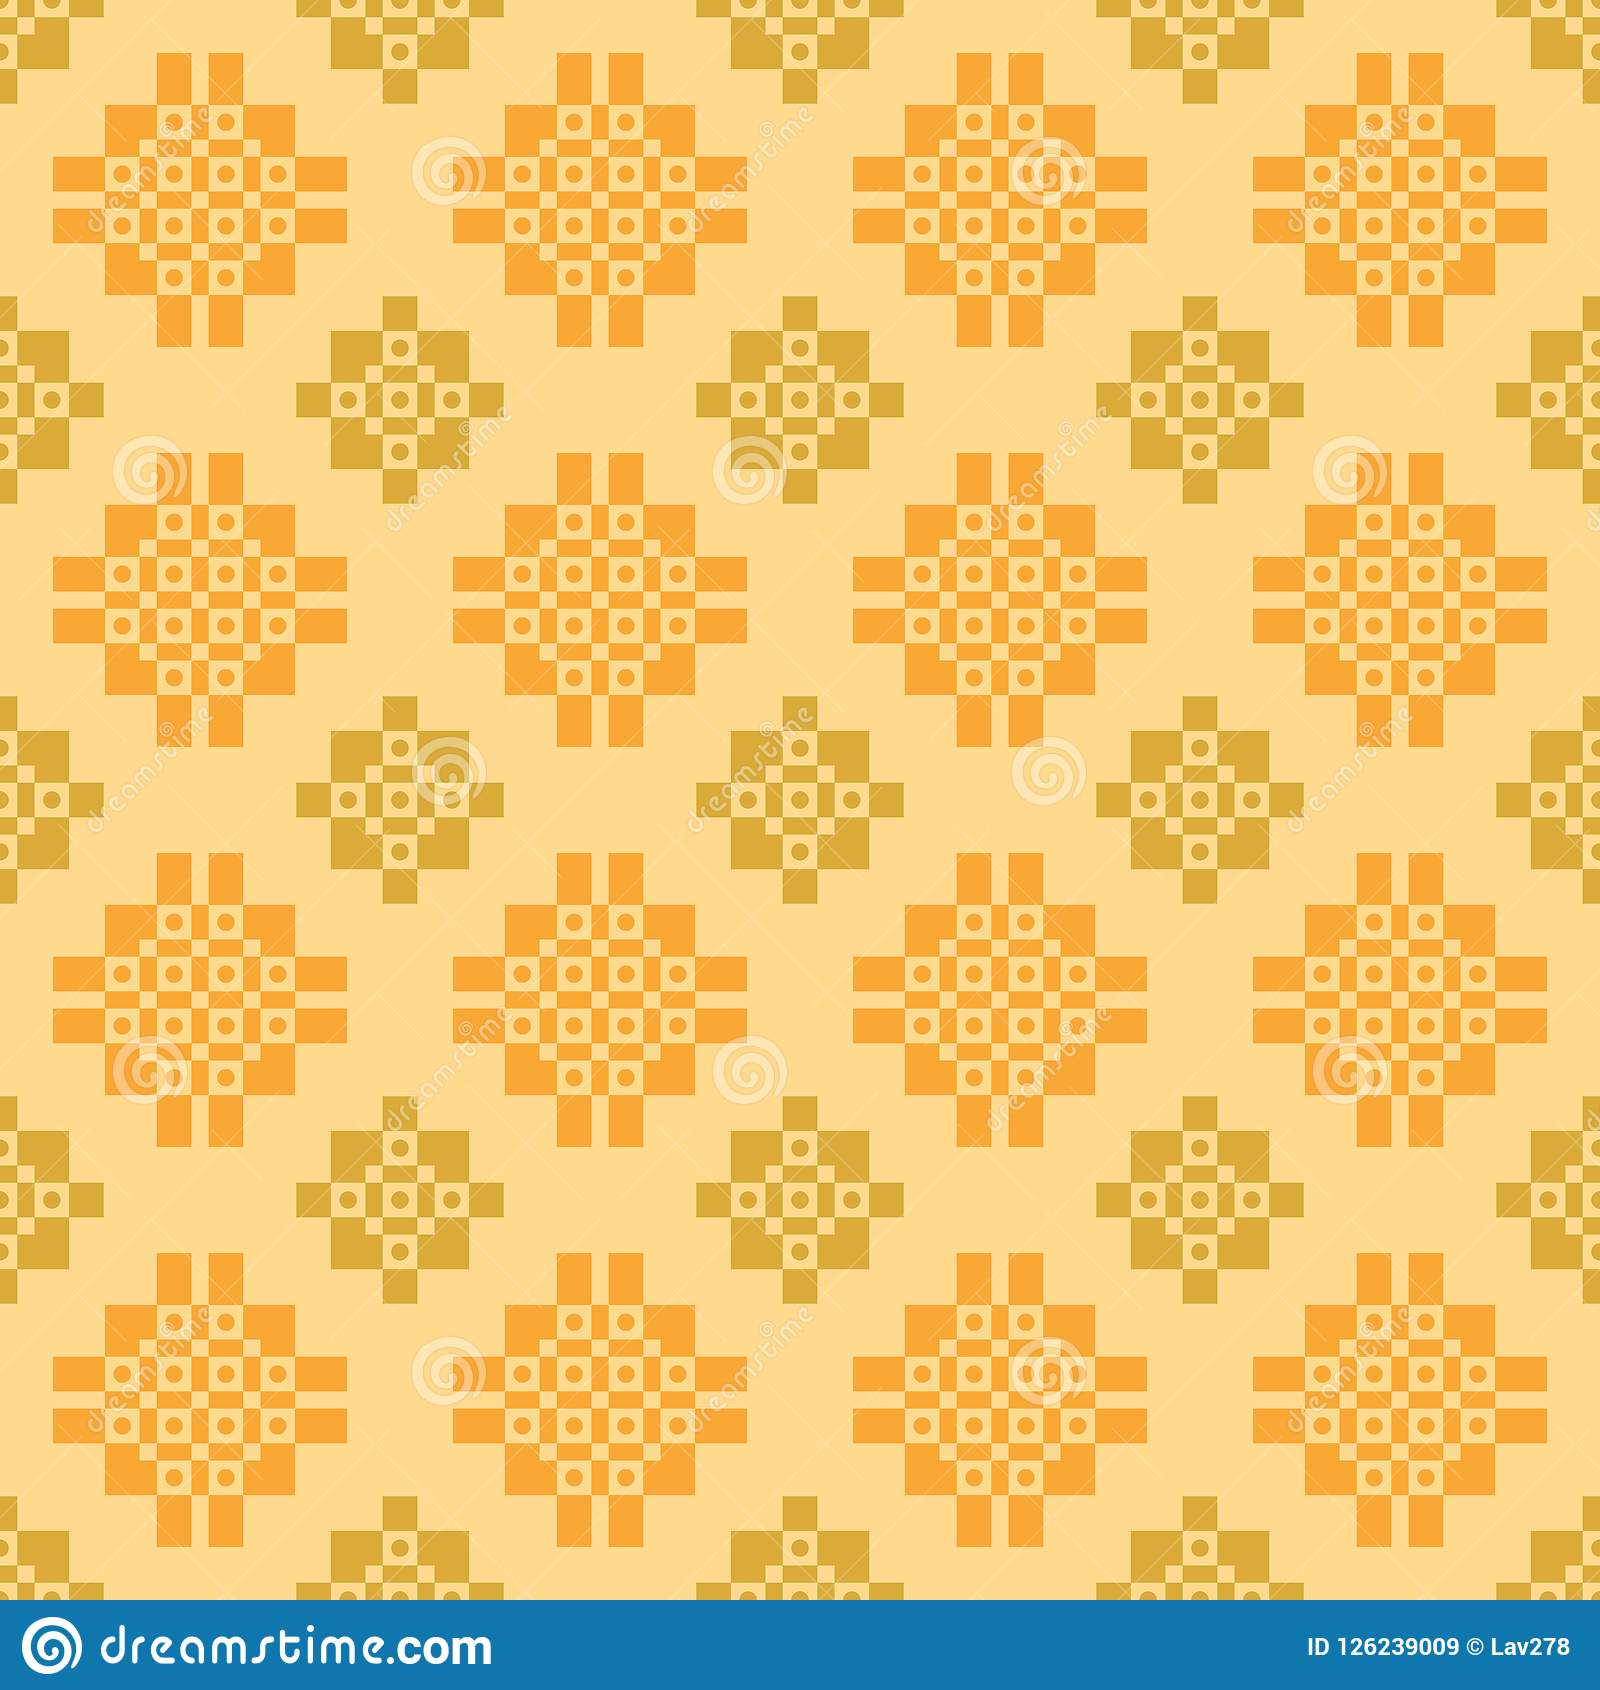 Subtle ethnic pattern on yellow background